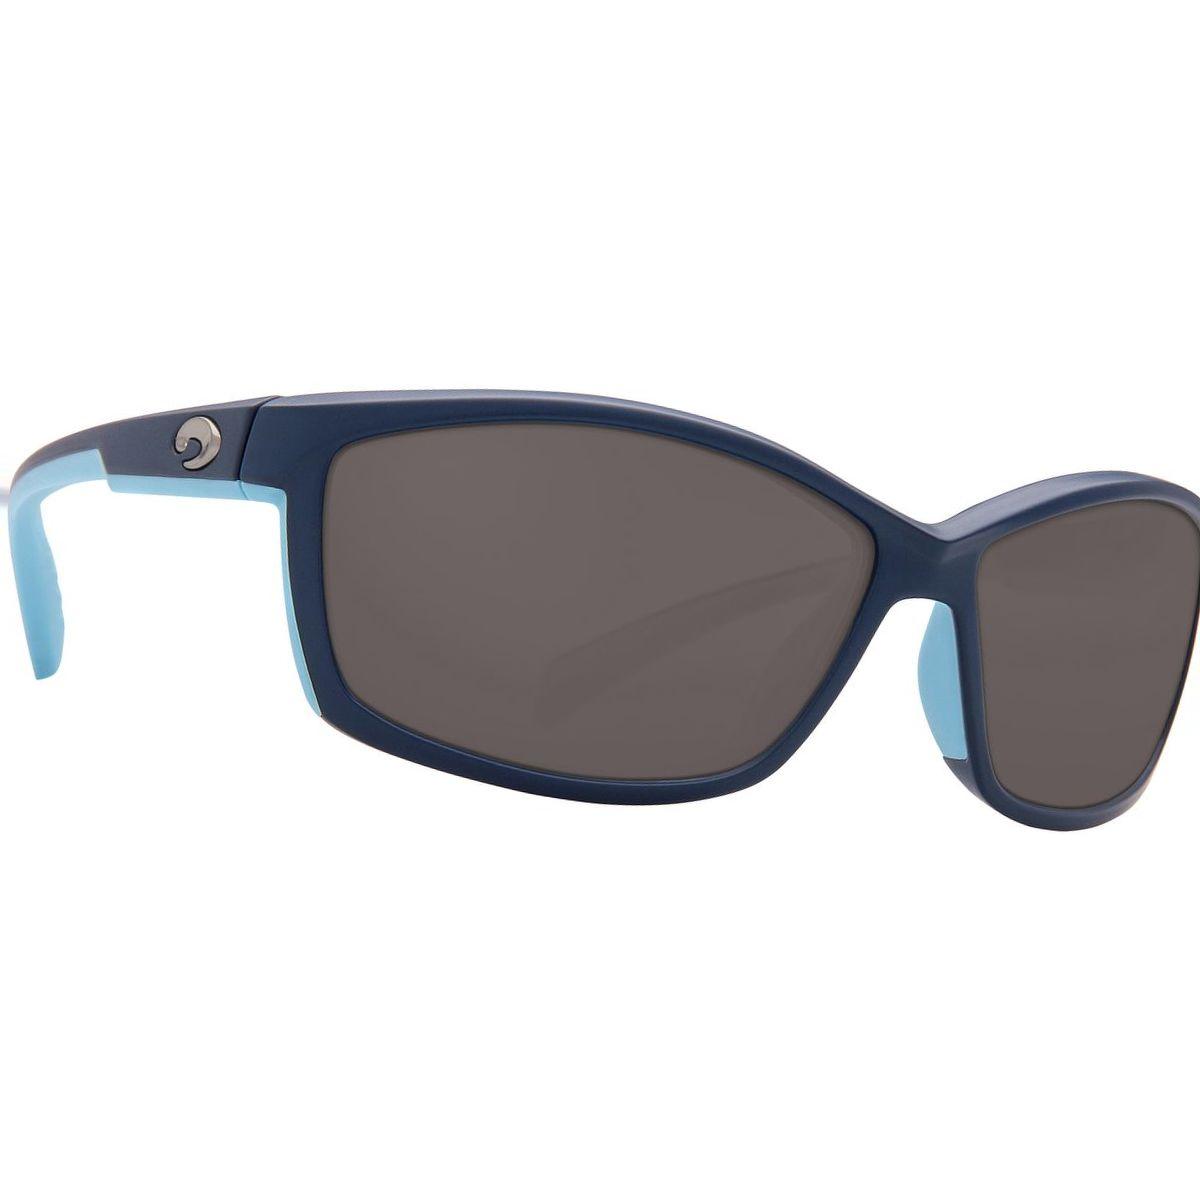 Costa Manta 580G Polarized Sunglasses - Women's